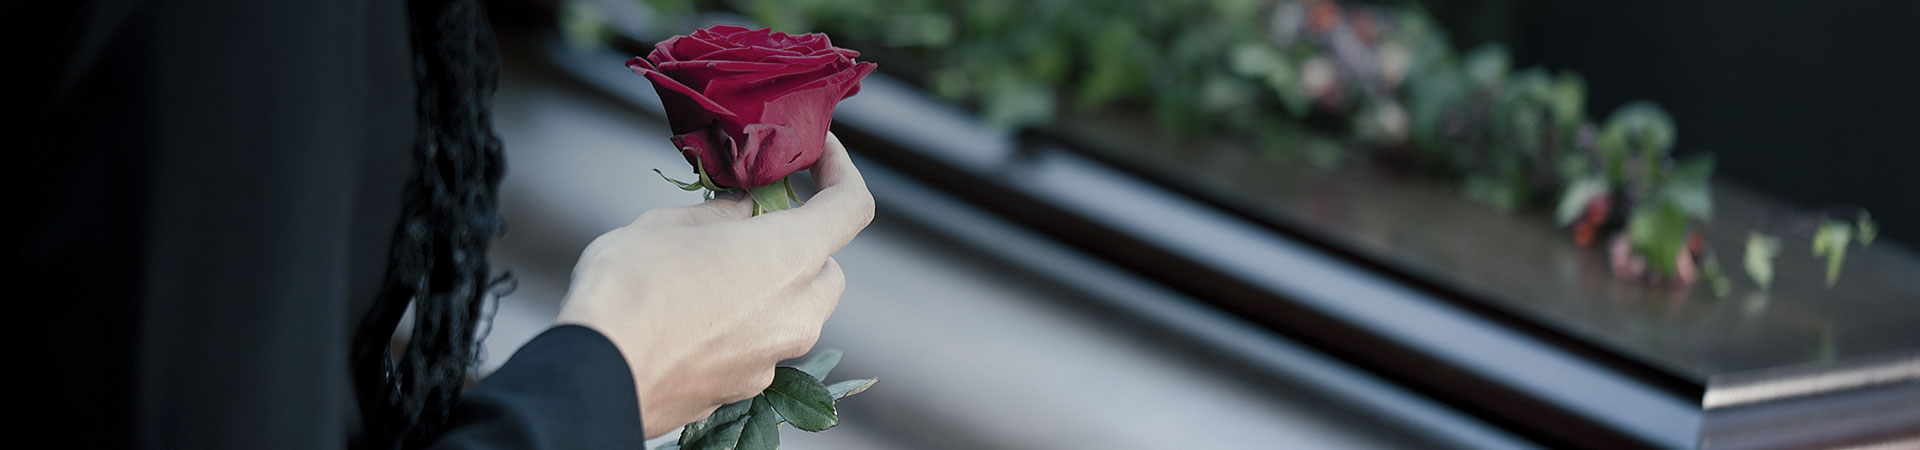 Porgere una rosa - Gesa Impresa Funeraria Internazionale